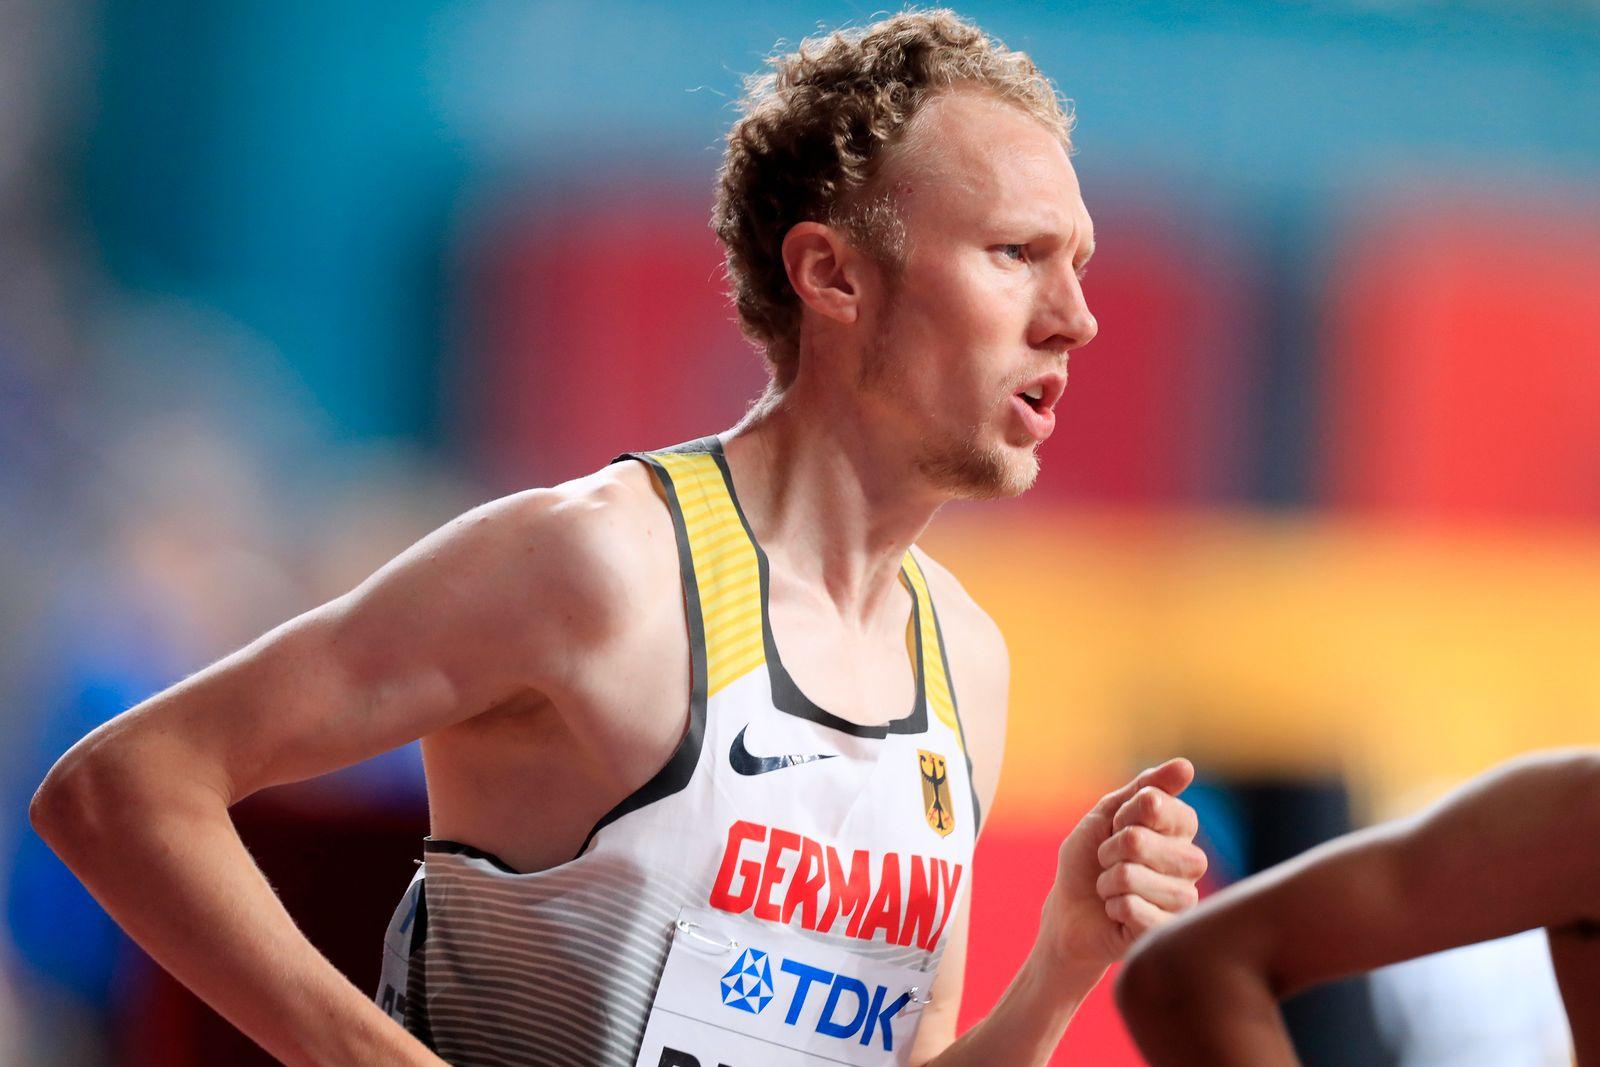 RINGER Richard Team GER 5000m Vorlauf IAAF WORLD CHAMPIONSHIPS 2019 in DOHA Al Khalifa International Stadion *** RINGER